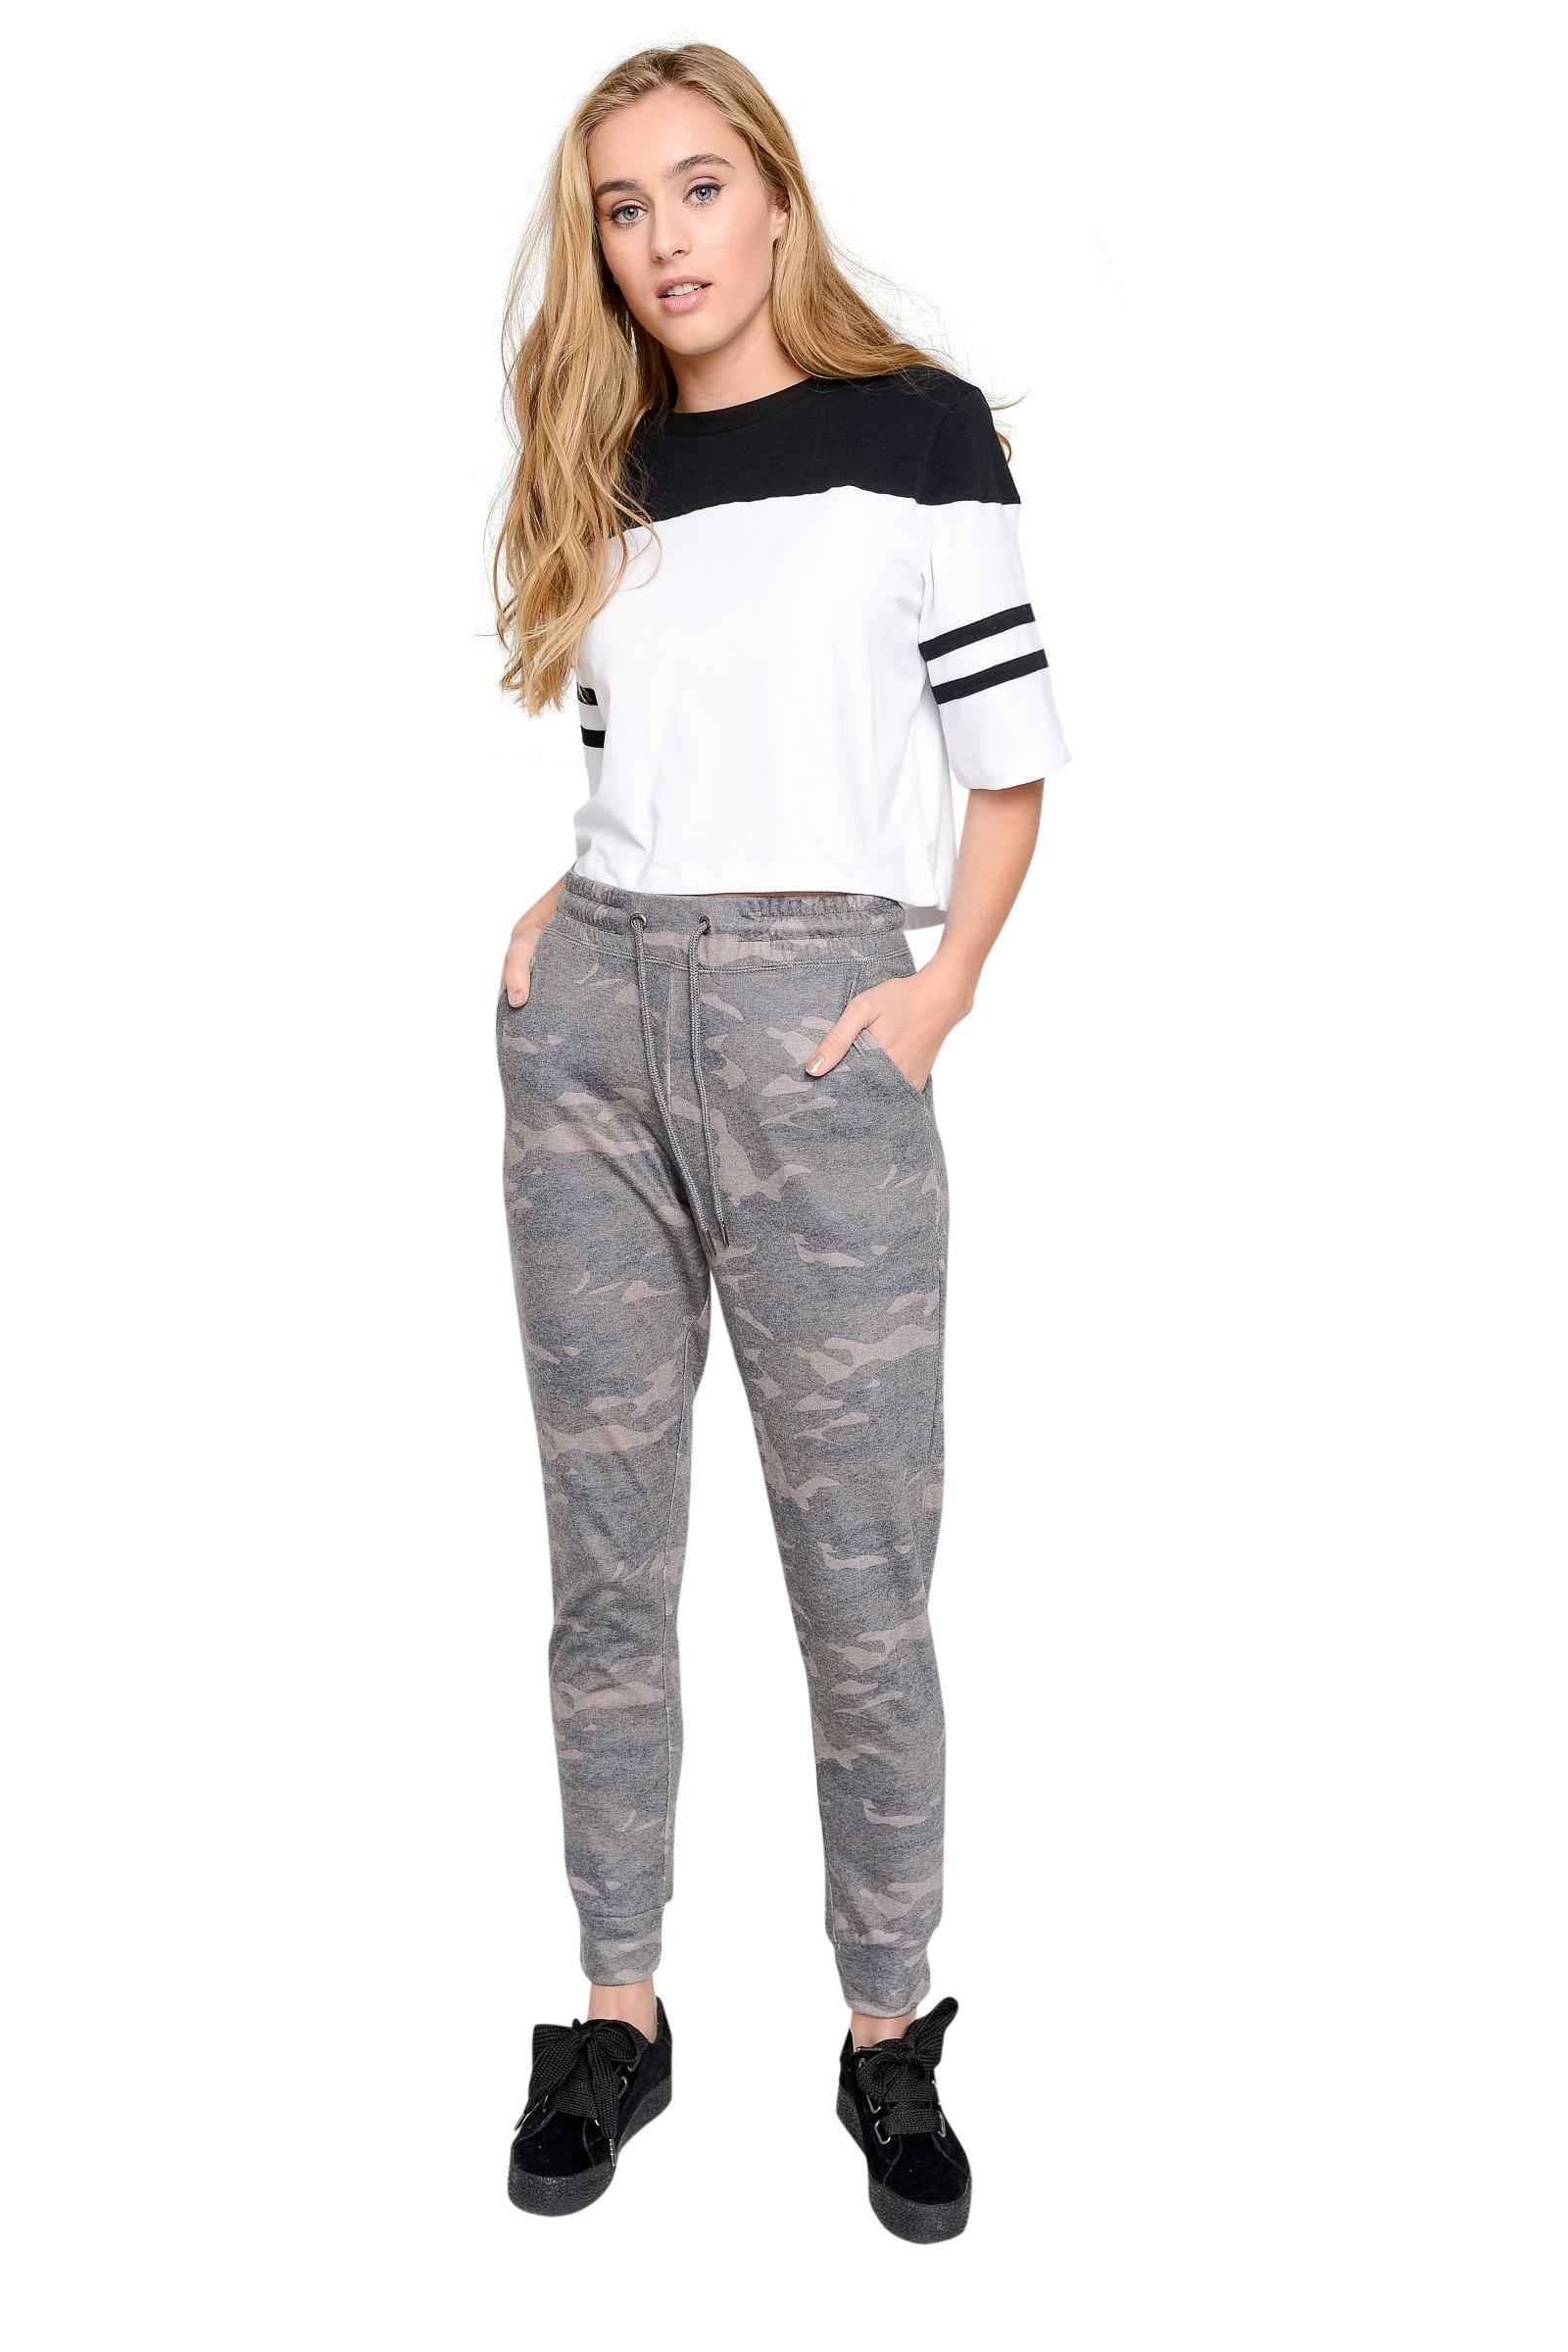 Ardene Women's - Sweatpants & Joggers - Knit Sweatpants Medium -(8A-AP01983)